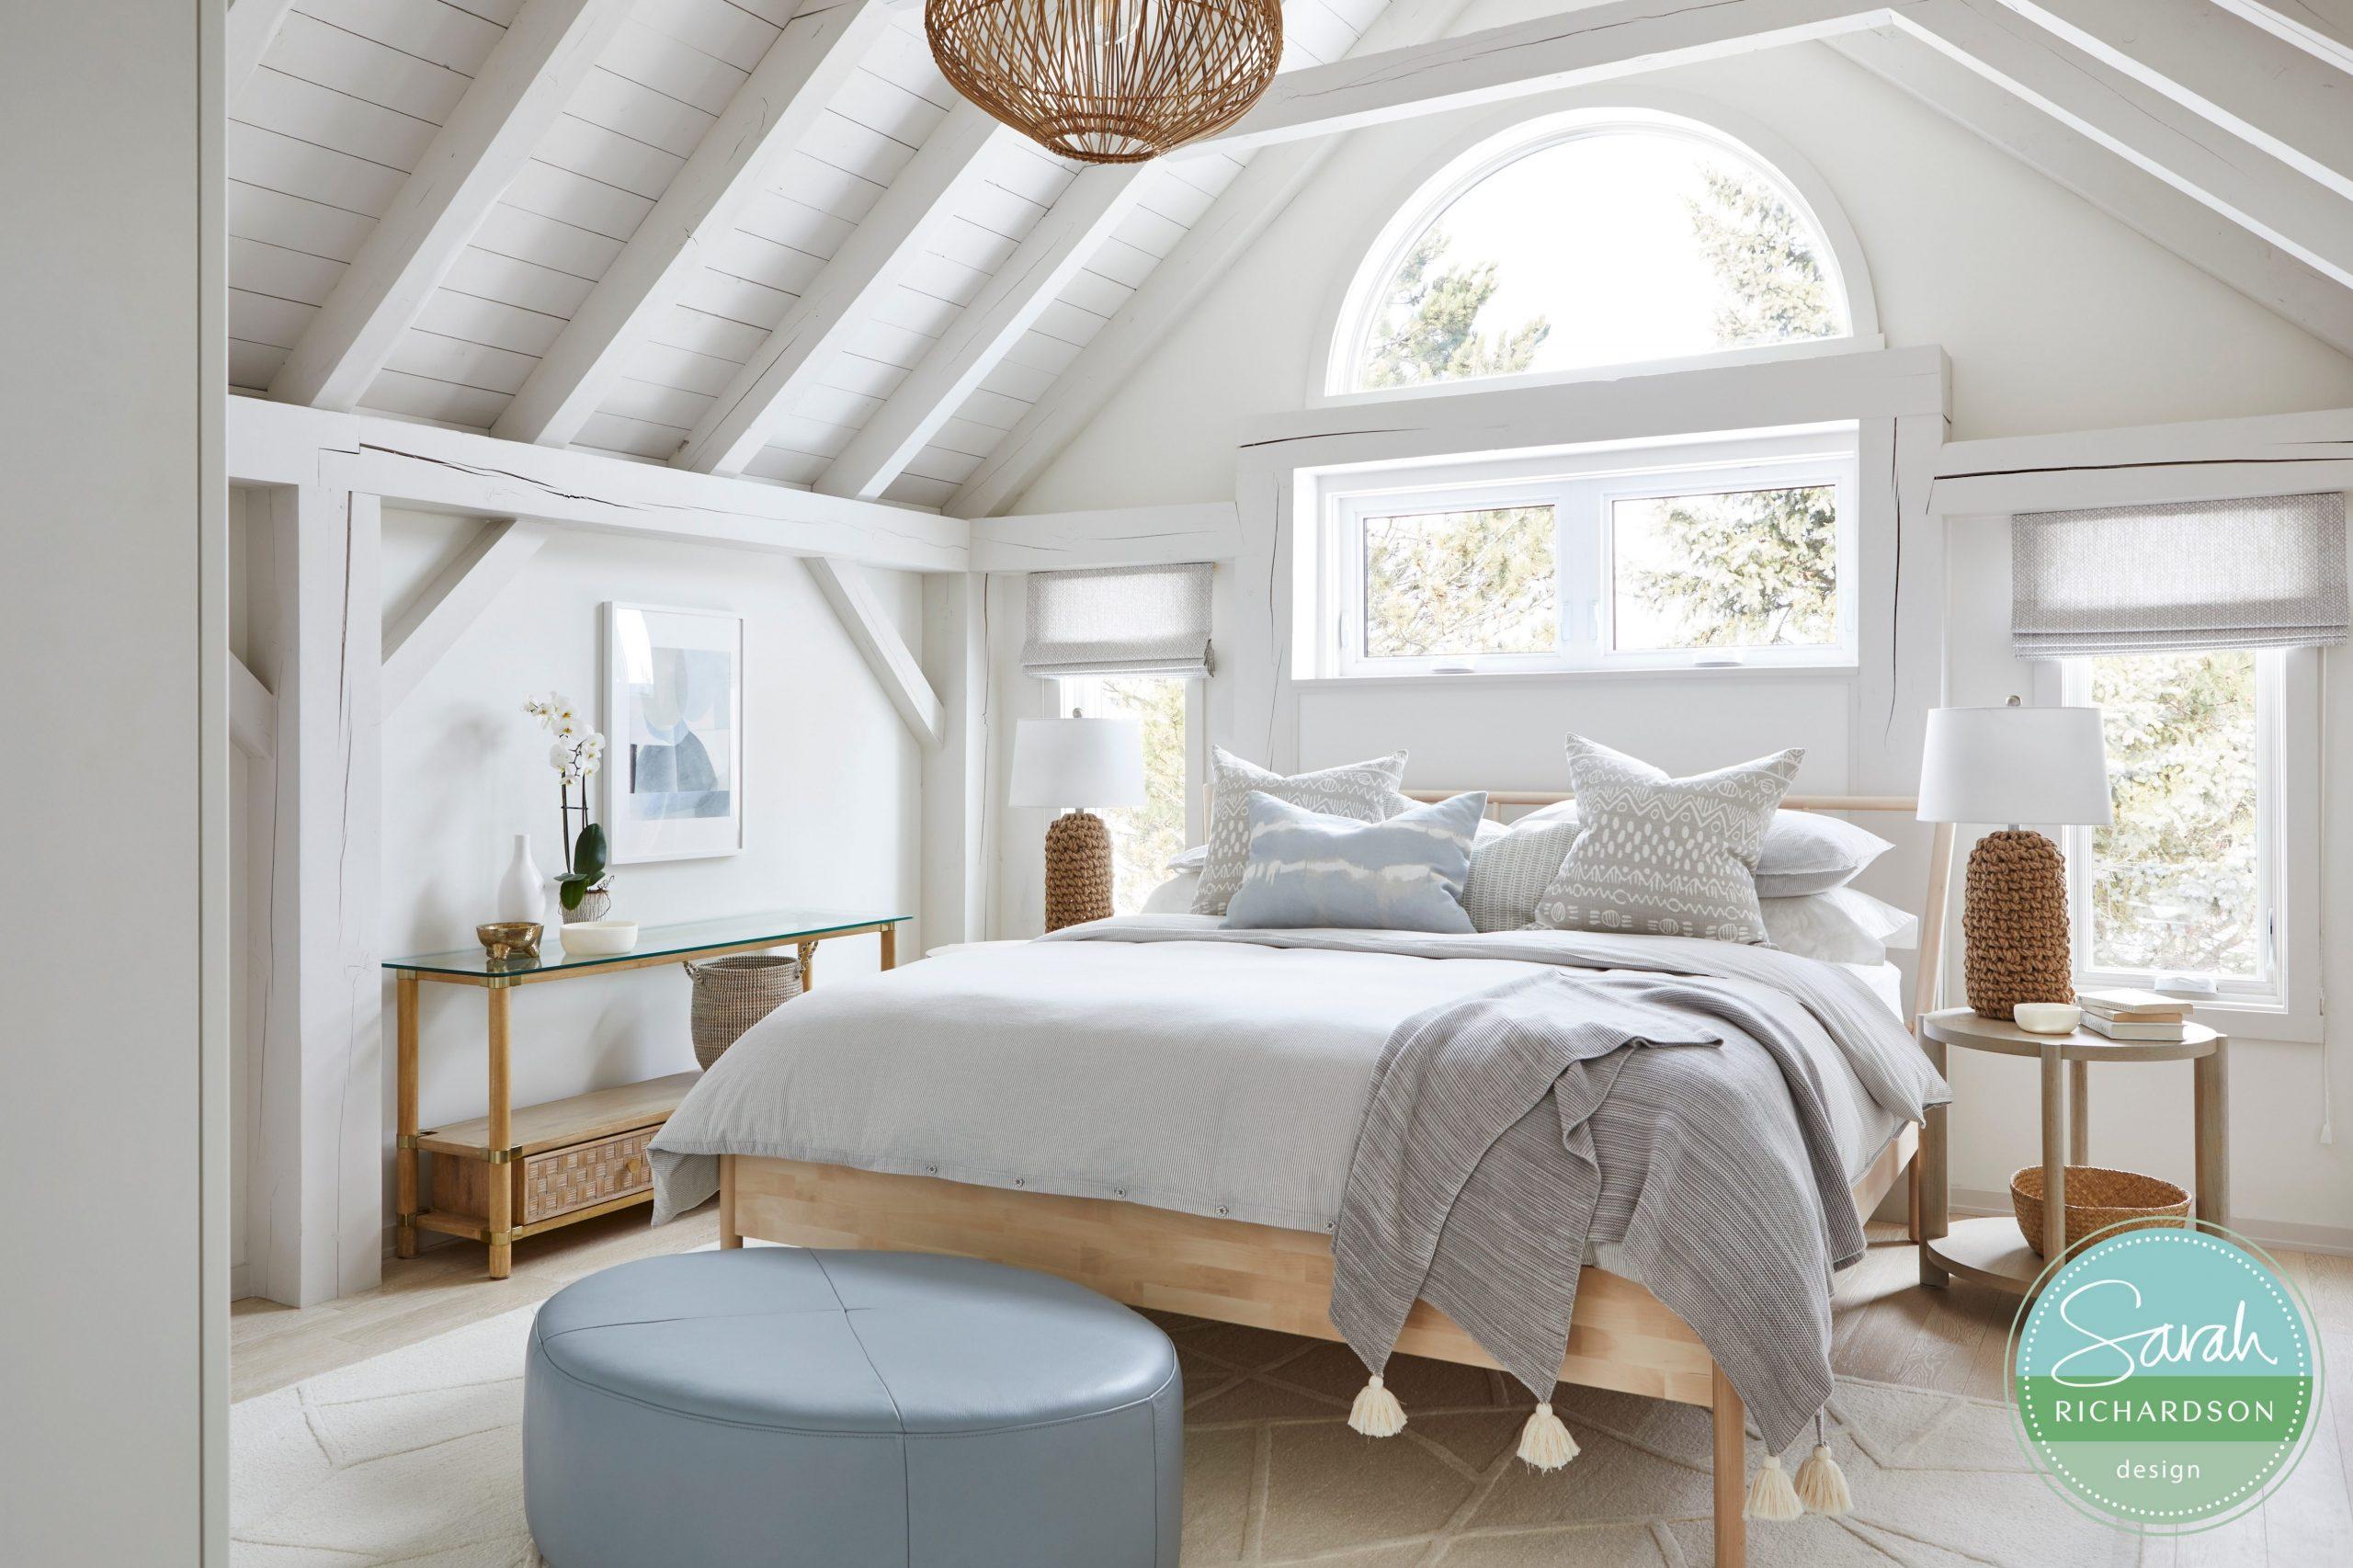 Normerica Timber Frames, Sarah Richardson Design, Master Bedroom, Painted Timbers